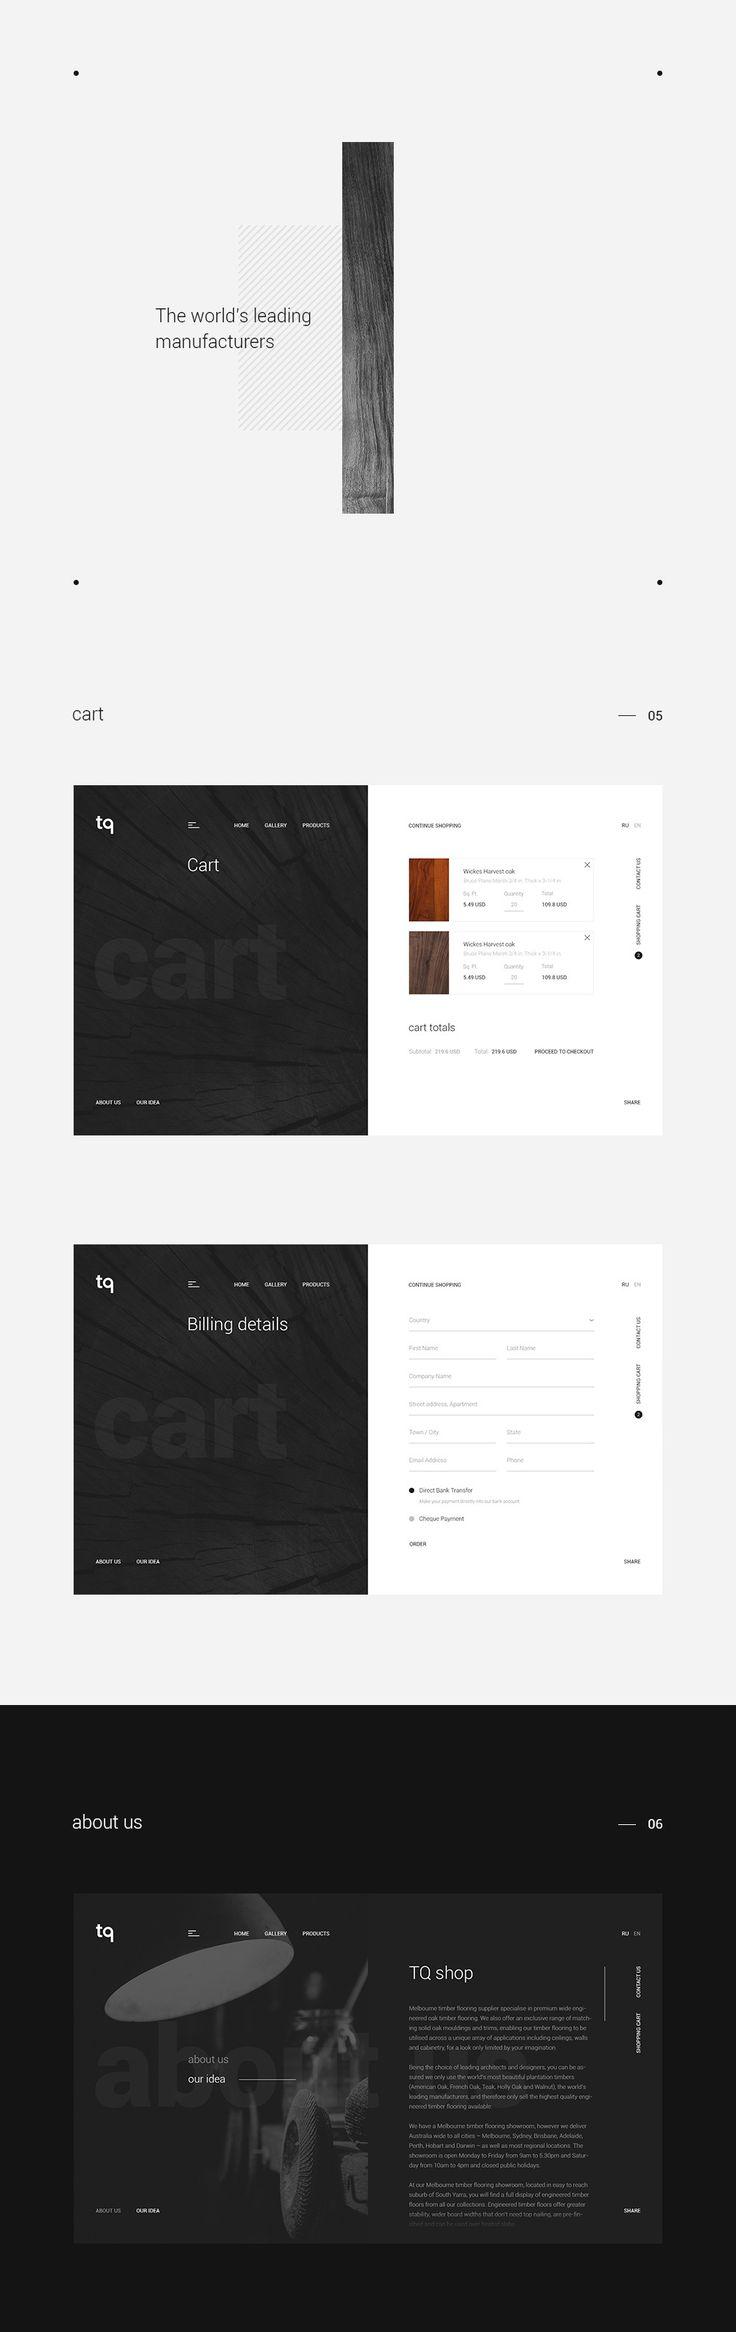 329 best Interface Design images on Pinterest | App design, User ...